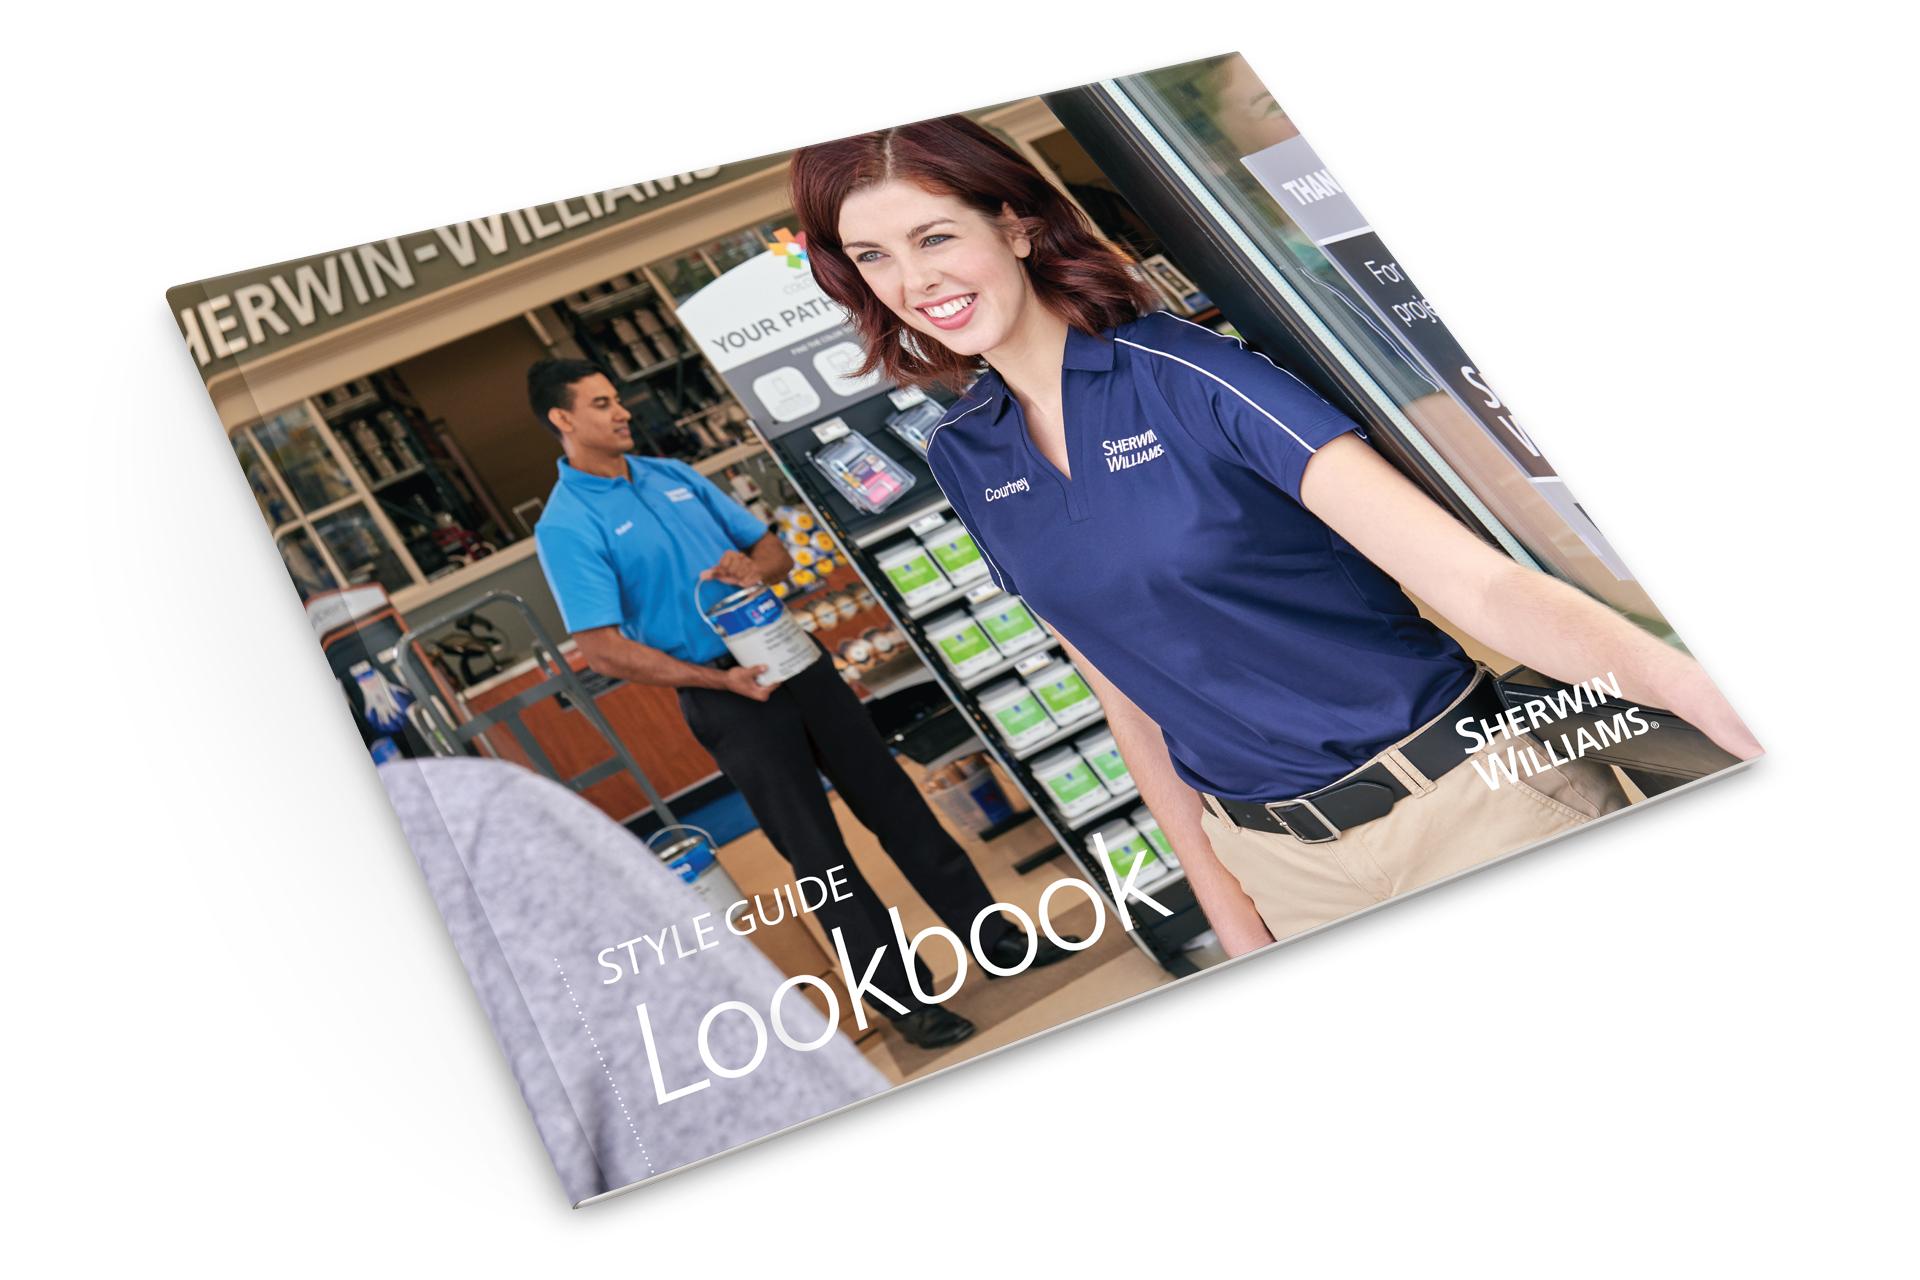 lookbook-images-1.jpg